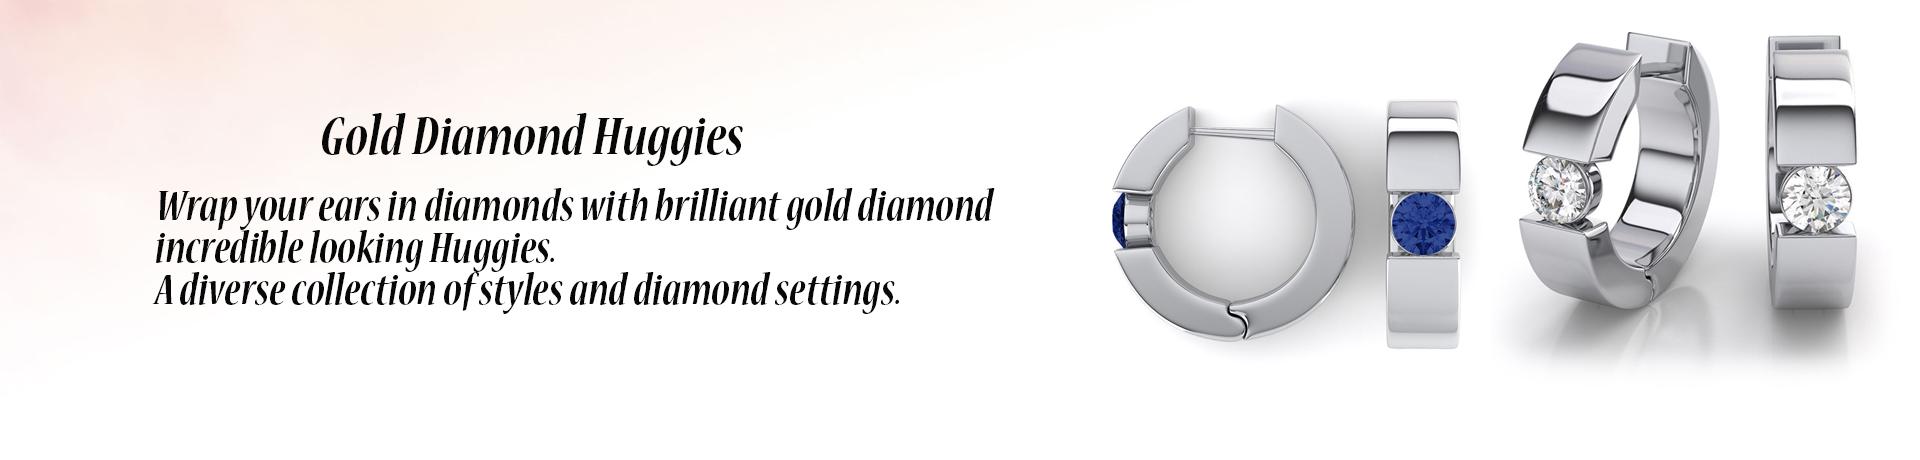 Gold Diamond Huggies